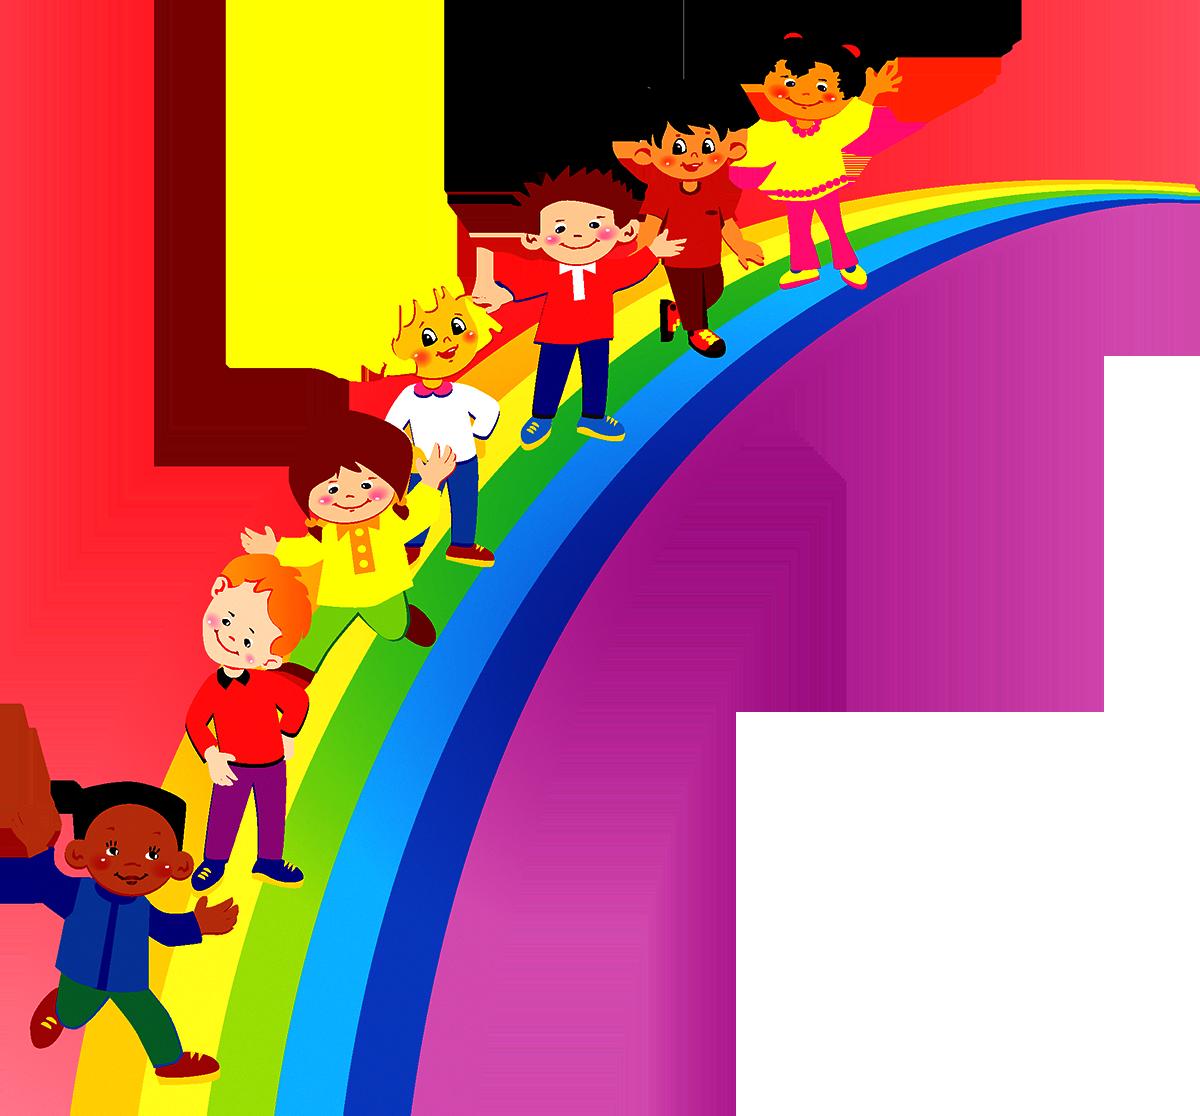 Pre school children clipart graphic transparent library Pre-school Kindergarten Information Clip art - Rainbow Children 1200 ... graphic transparent library